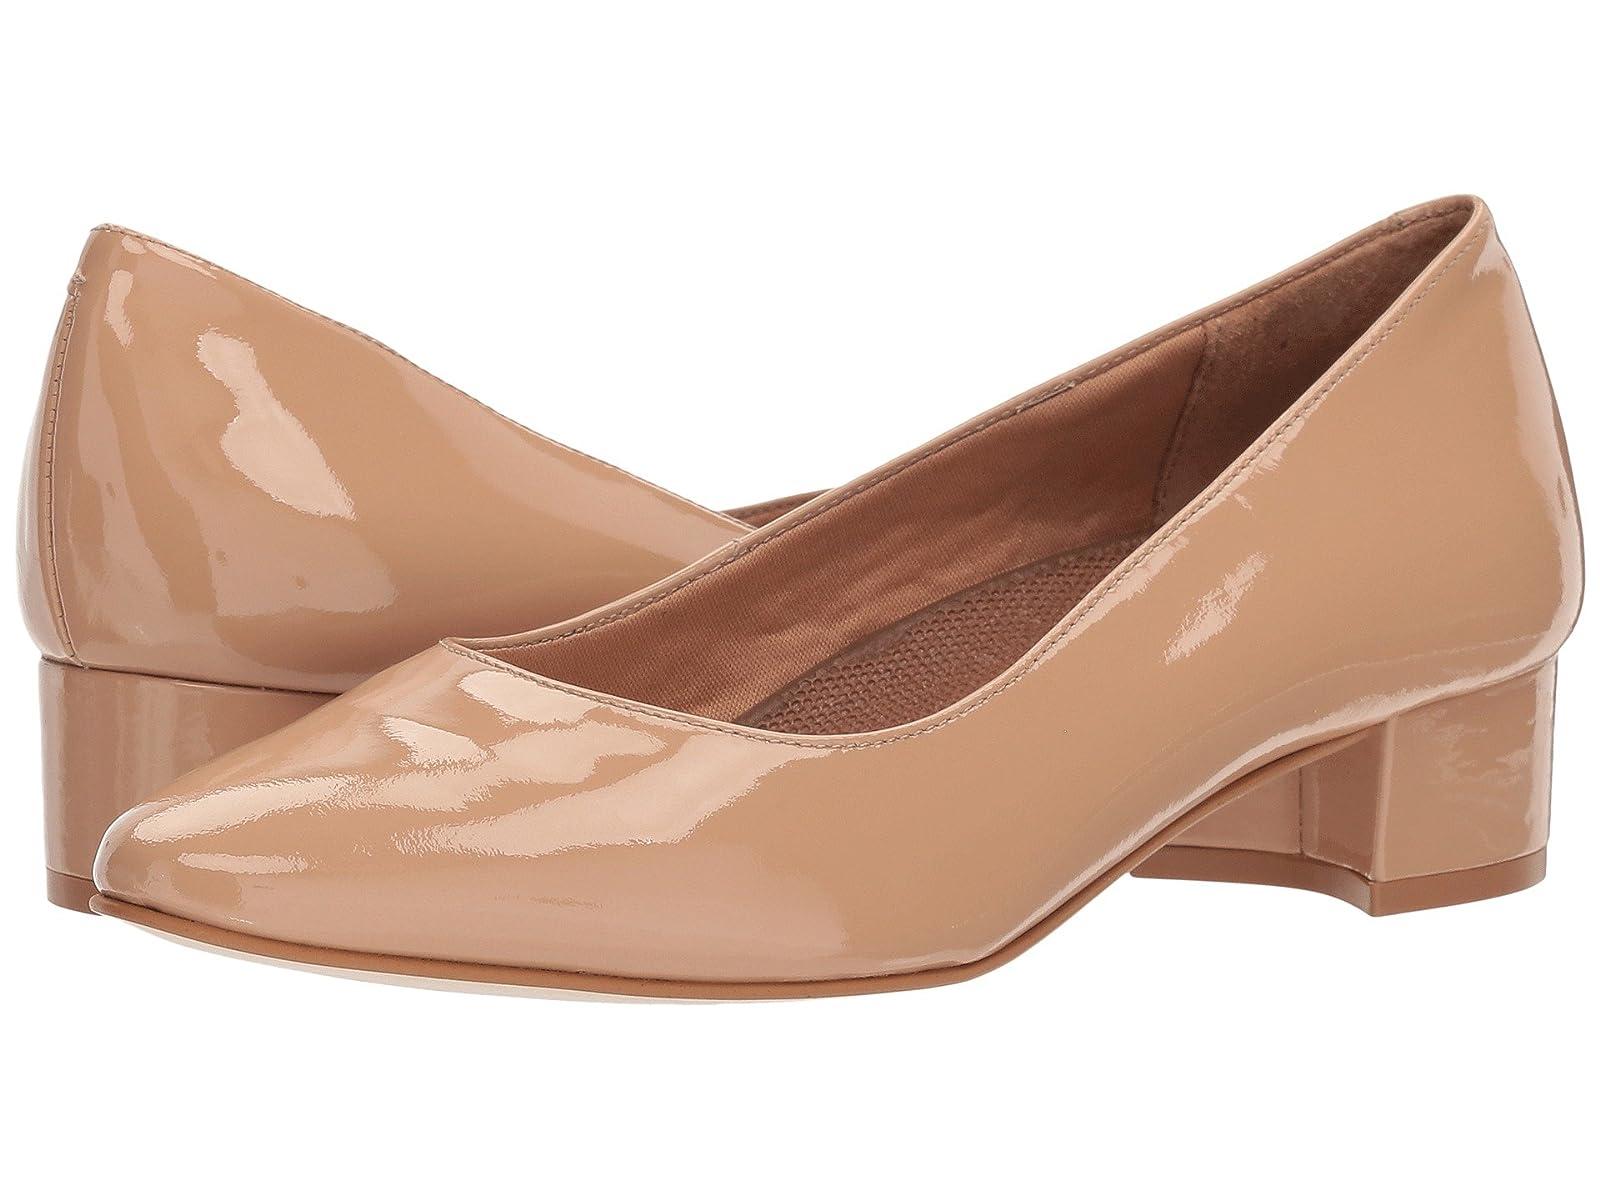 Walking Cradles HeidiAtmospheric grades have affordable shoes